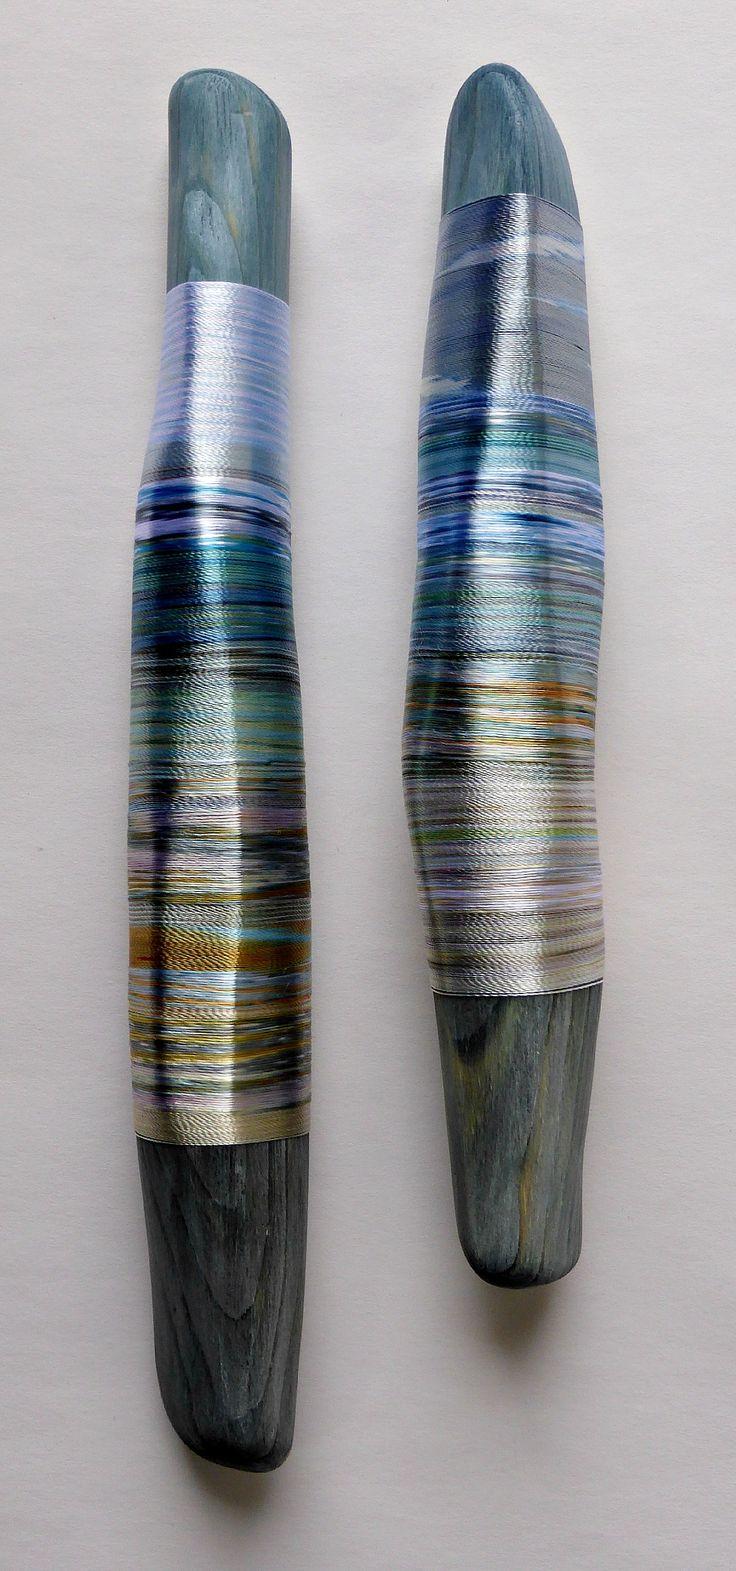 Helena Emmans | Rhythms of Reflected Shorelines | Hand-dyed threads